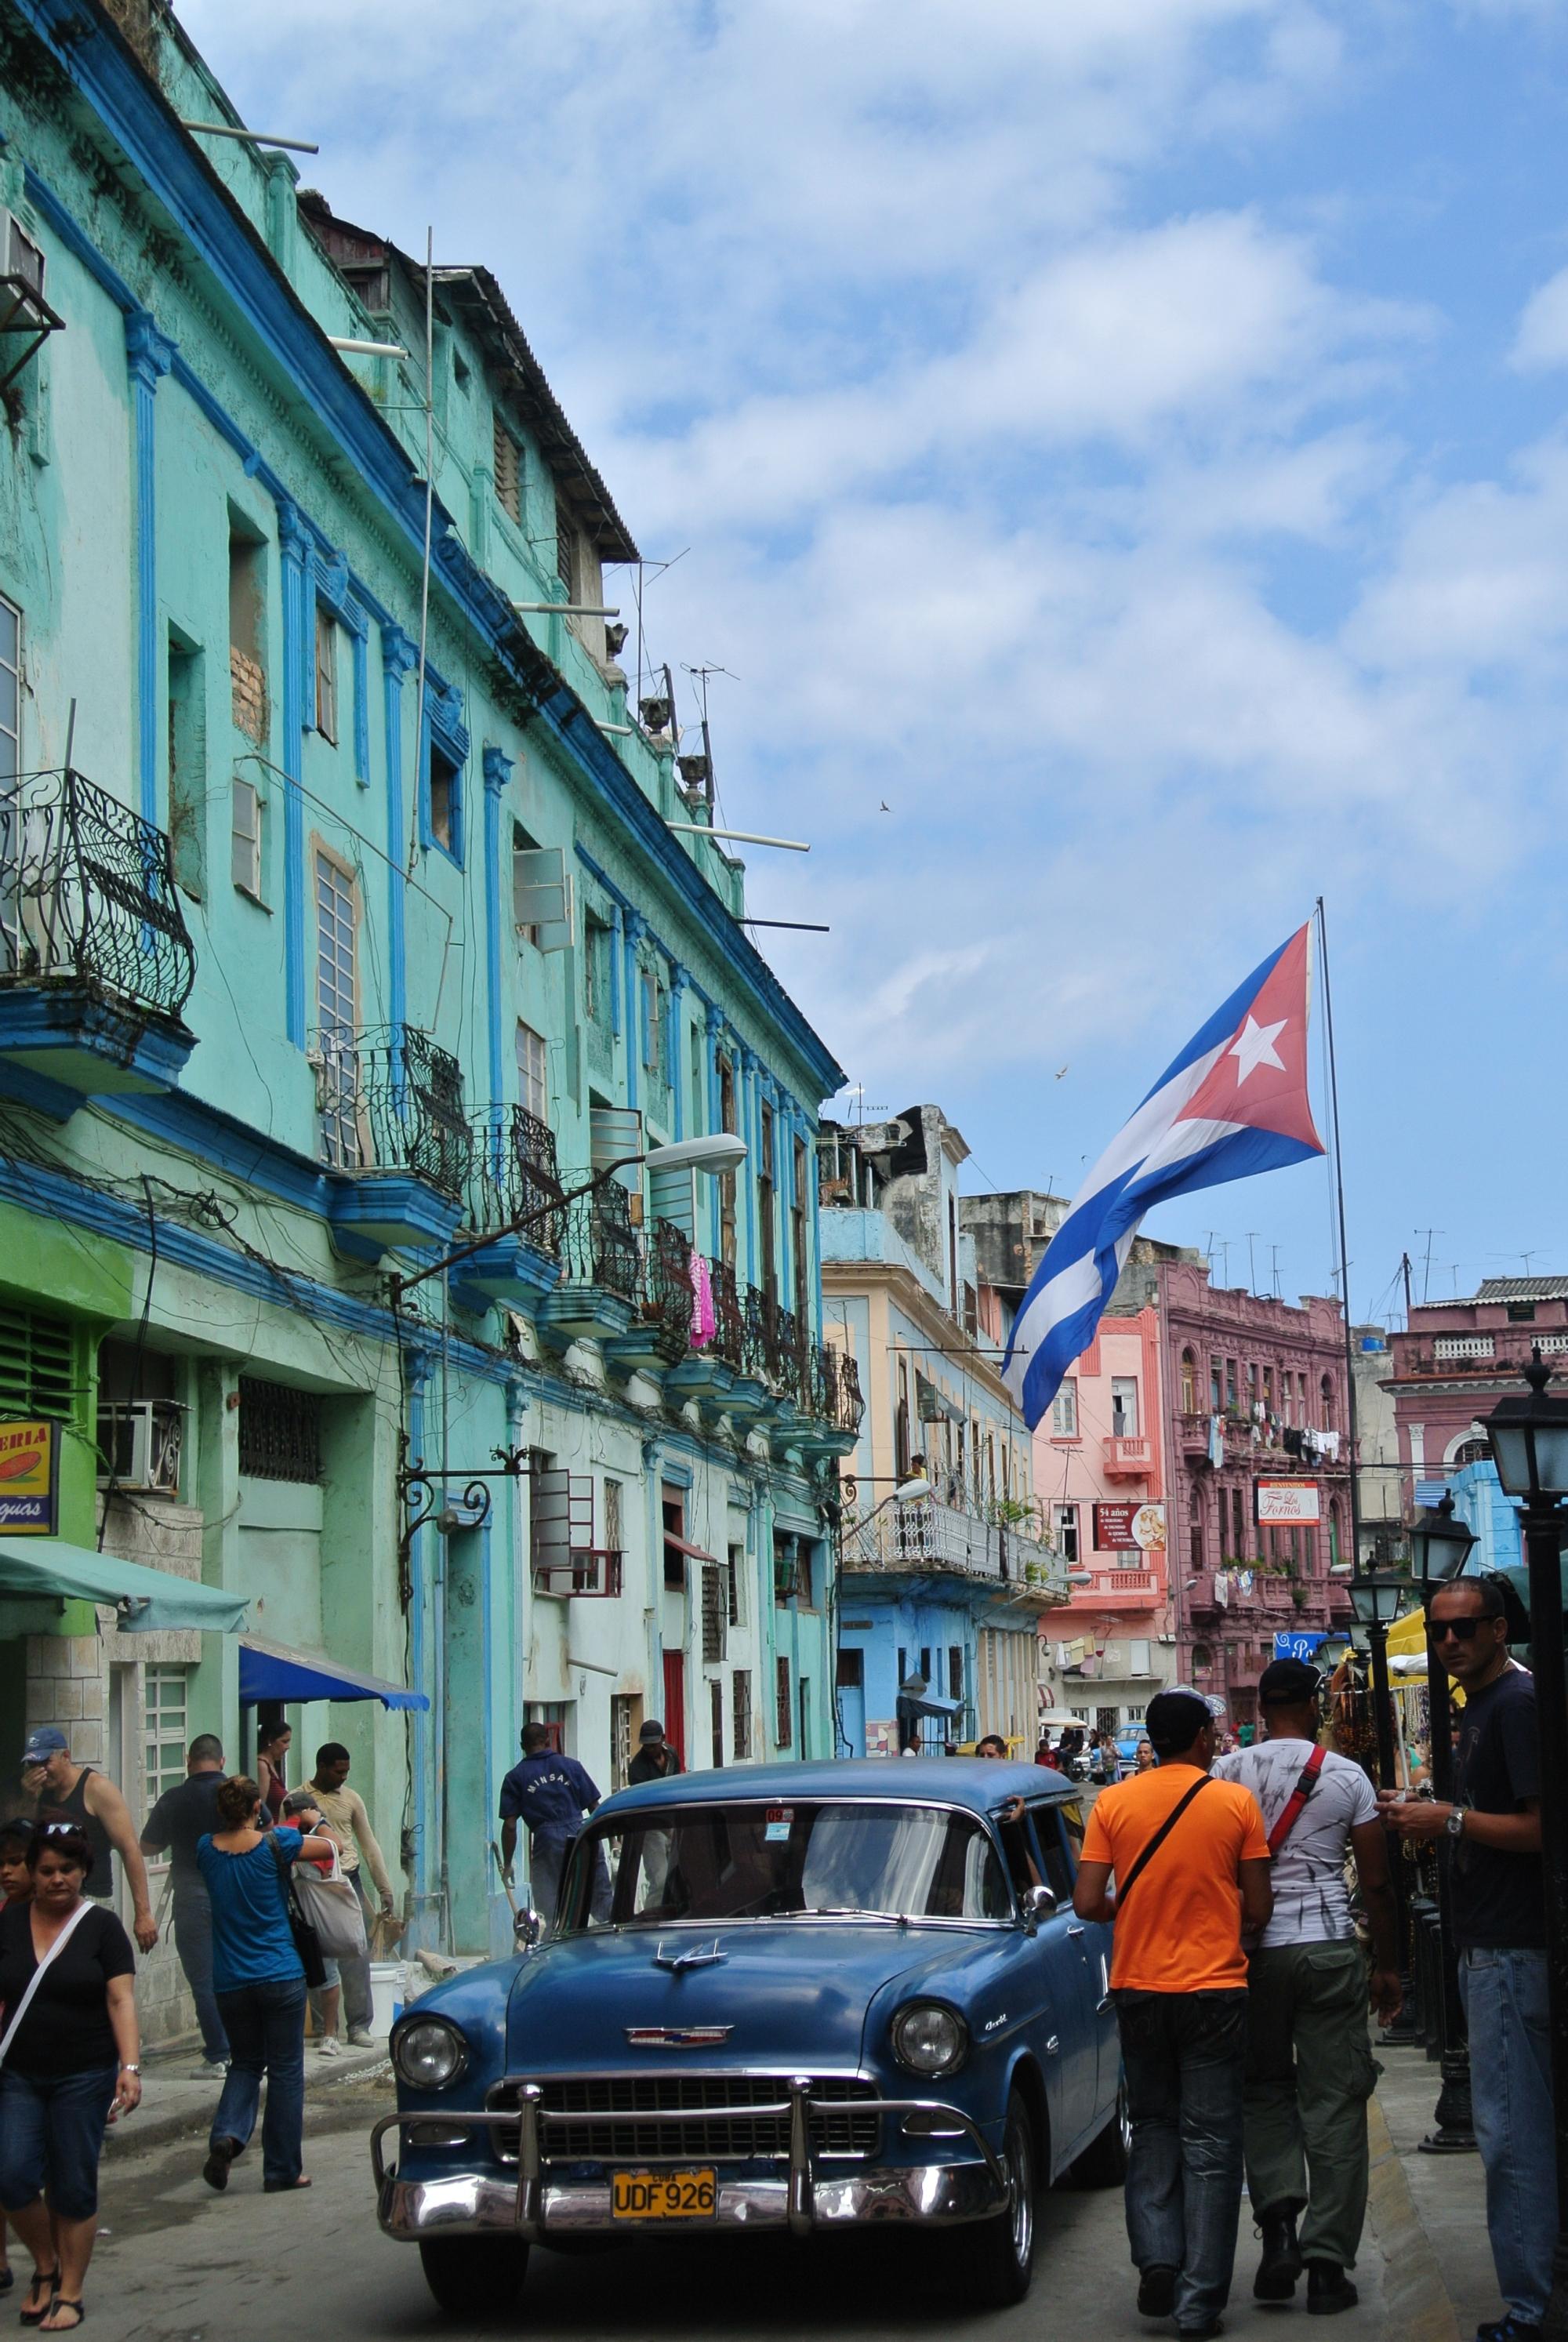 Blue vintage car, Cuba flag flying high in Havana